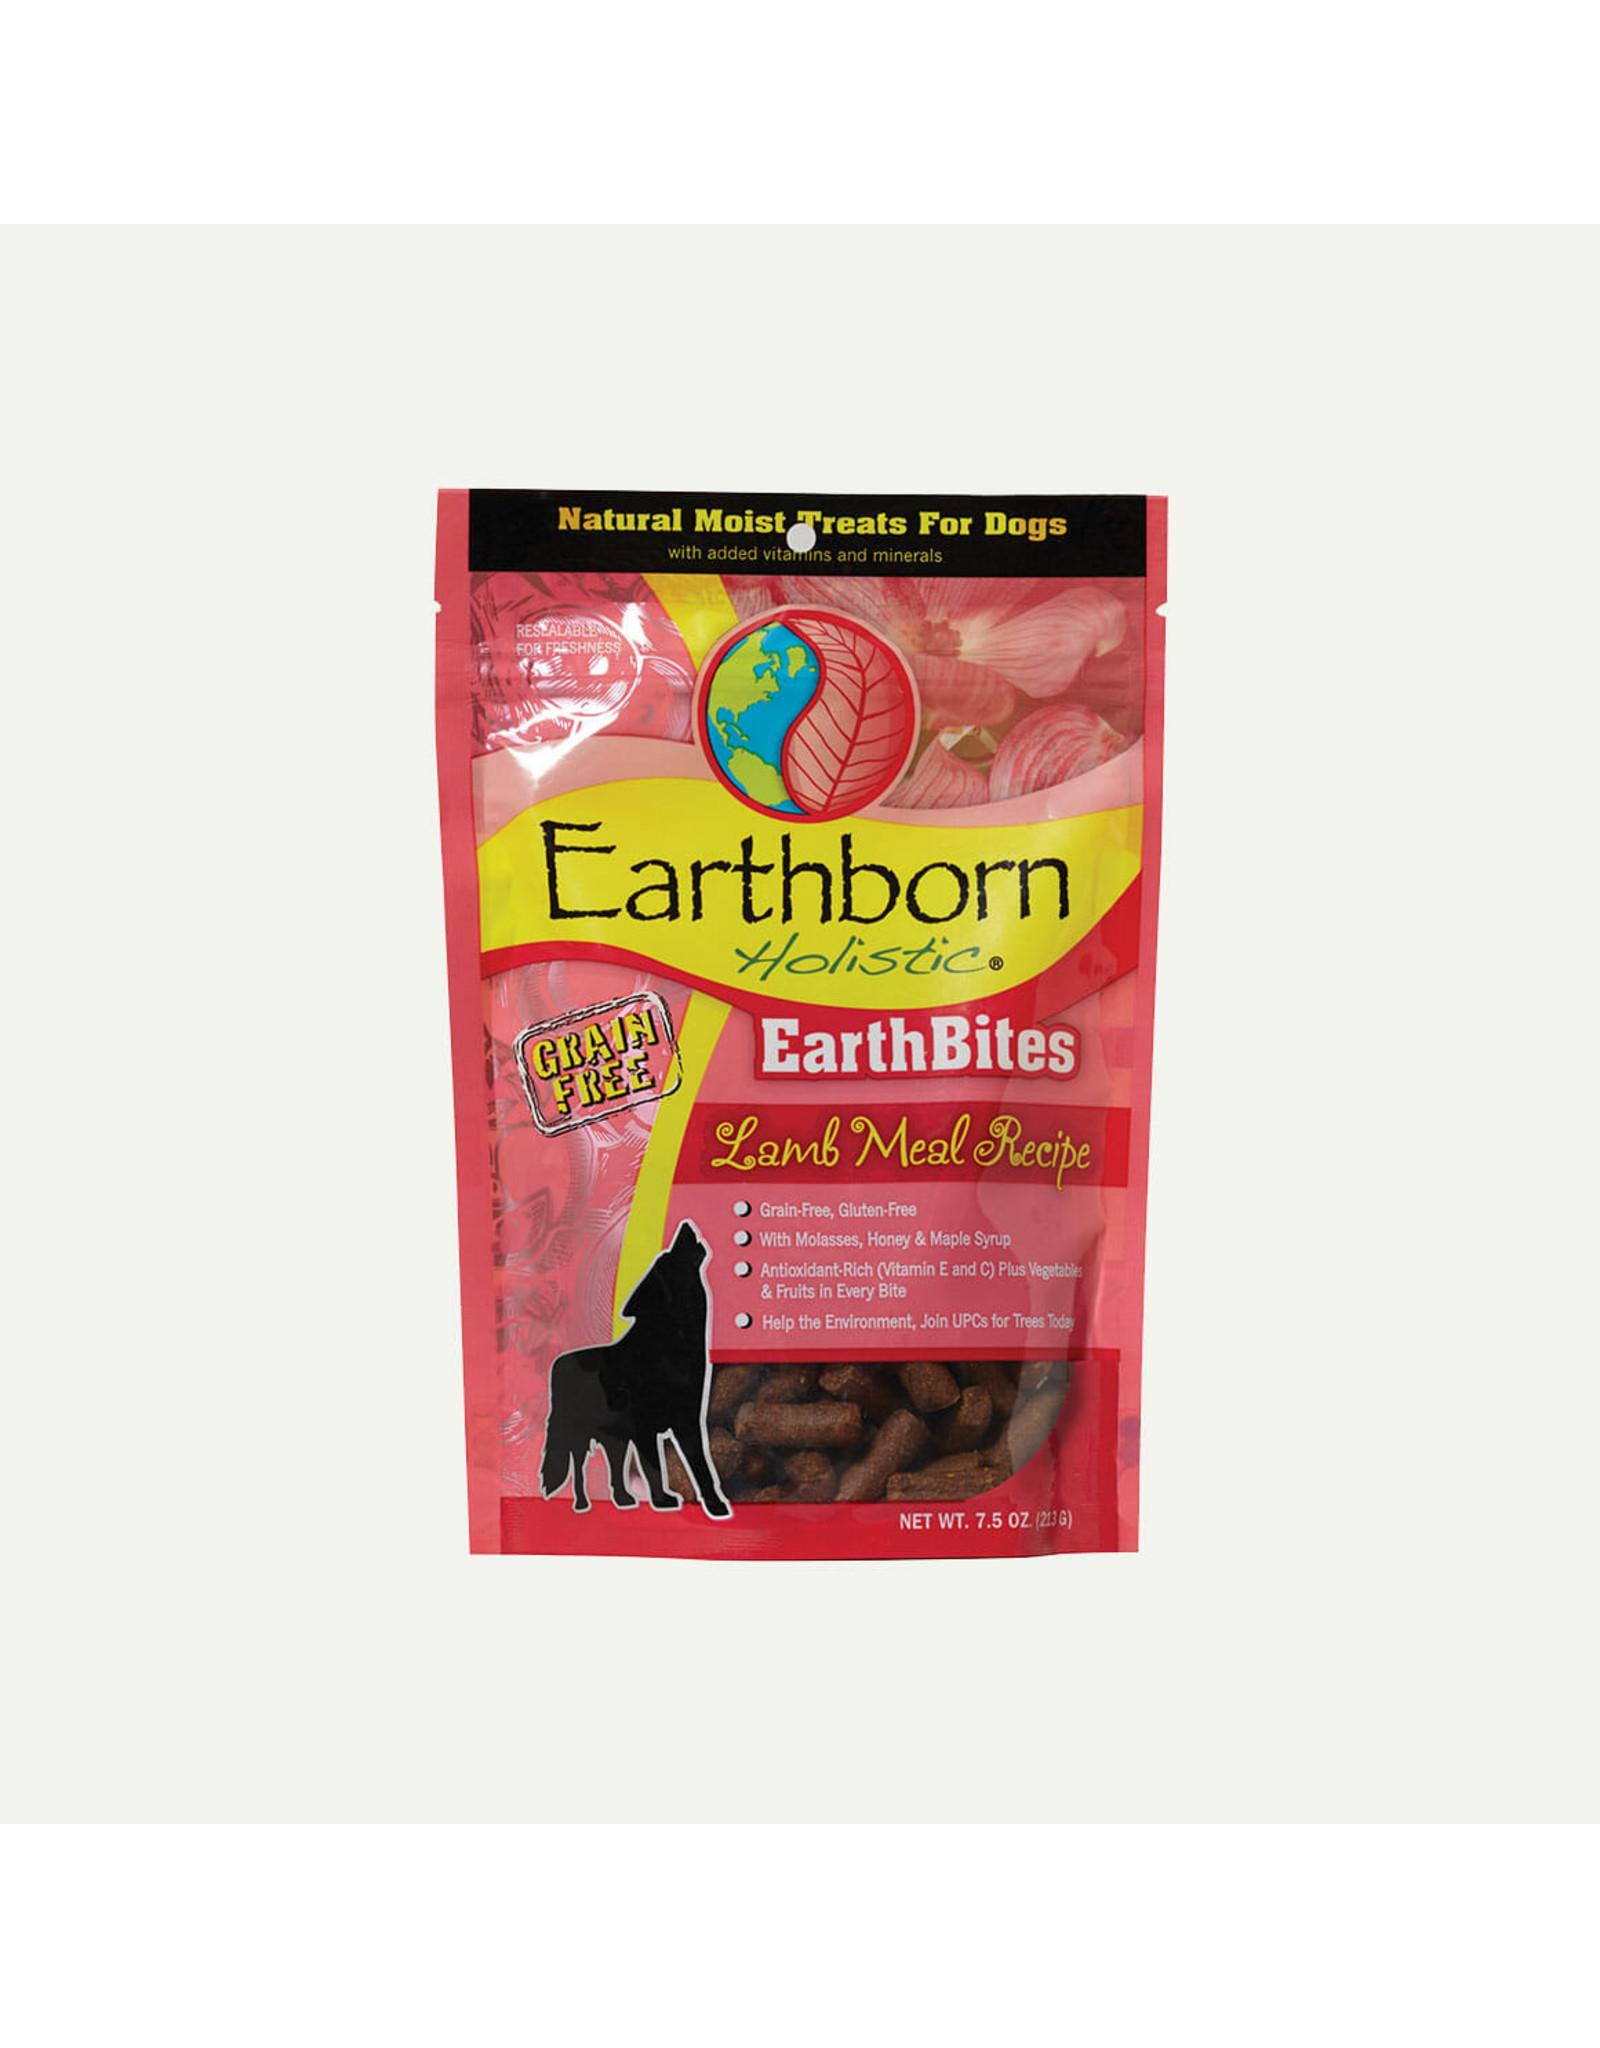 Earthborn Earthborn Earthbites Lamb Meal Recipe Natural Soft Dog Treats 7.5oz Grain Free